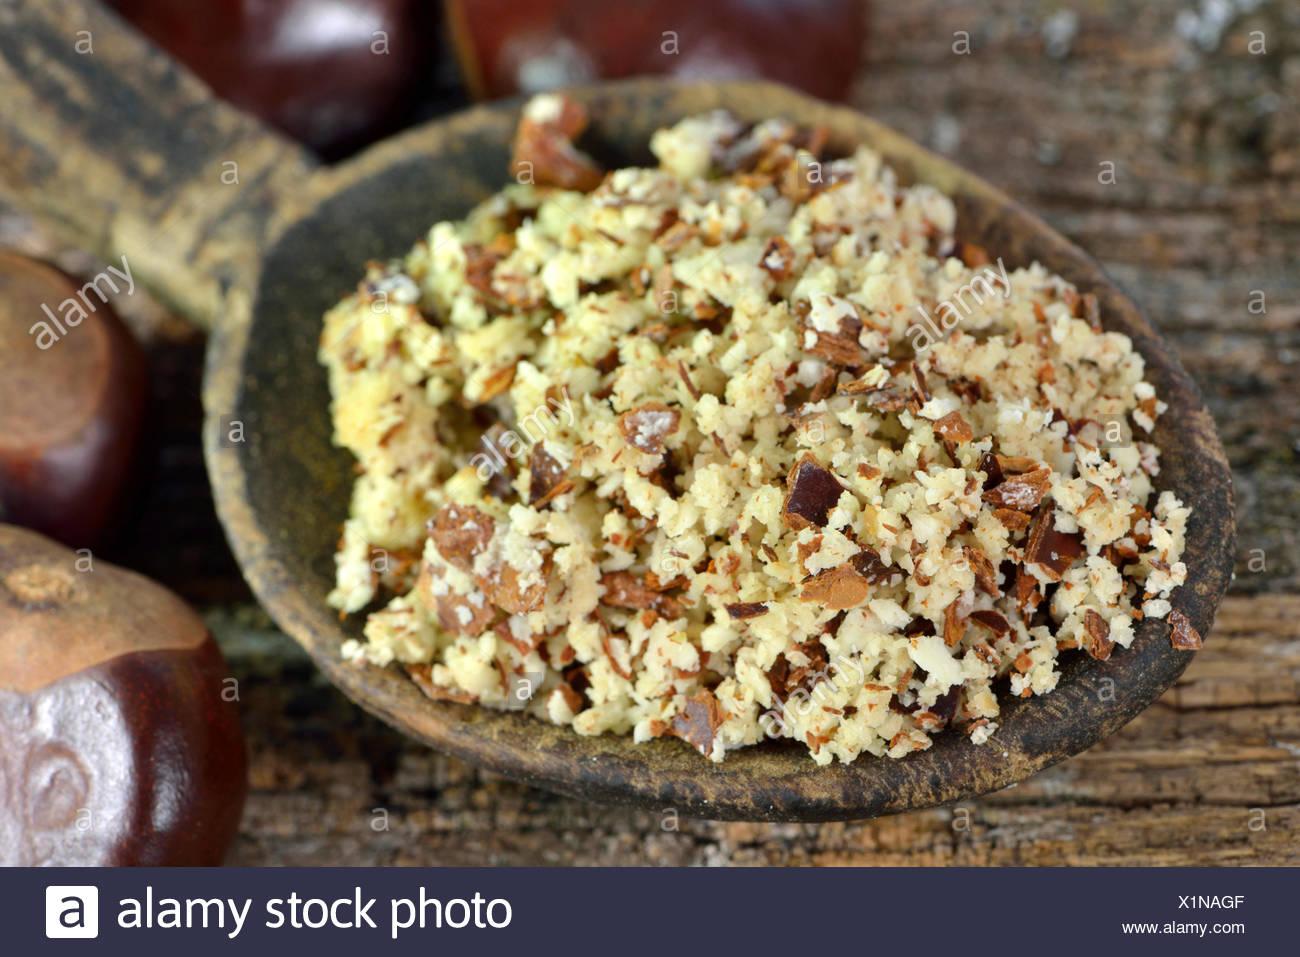 Chestnut, ground seeds / (Aesculus hippocastanum) - Stock Image